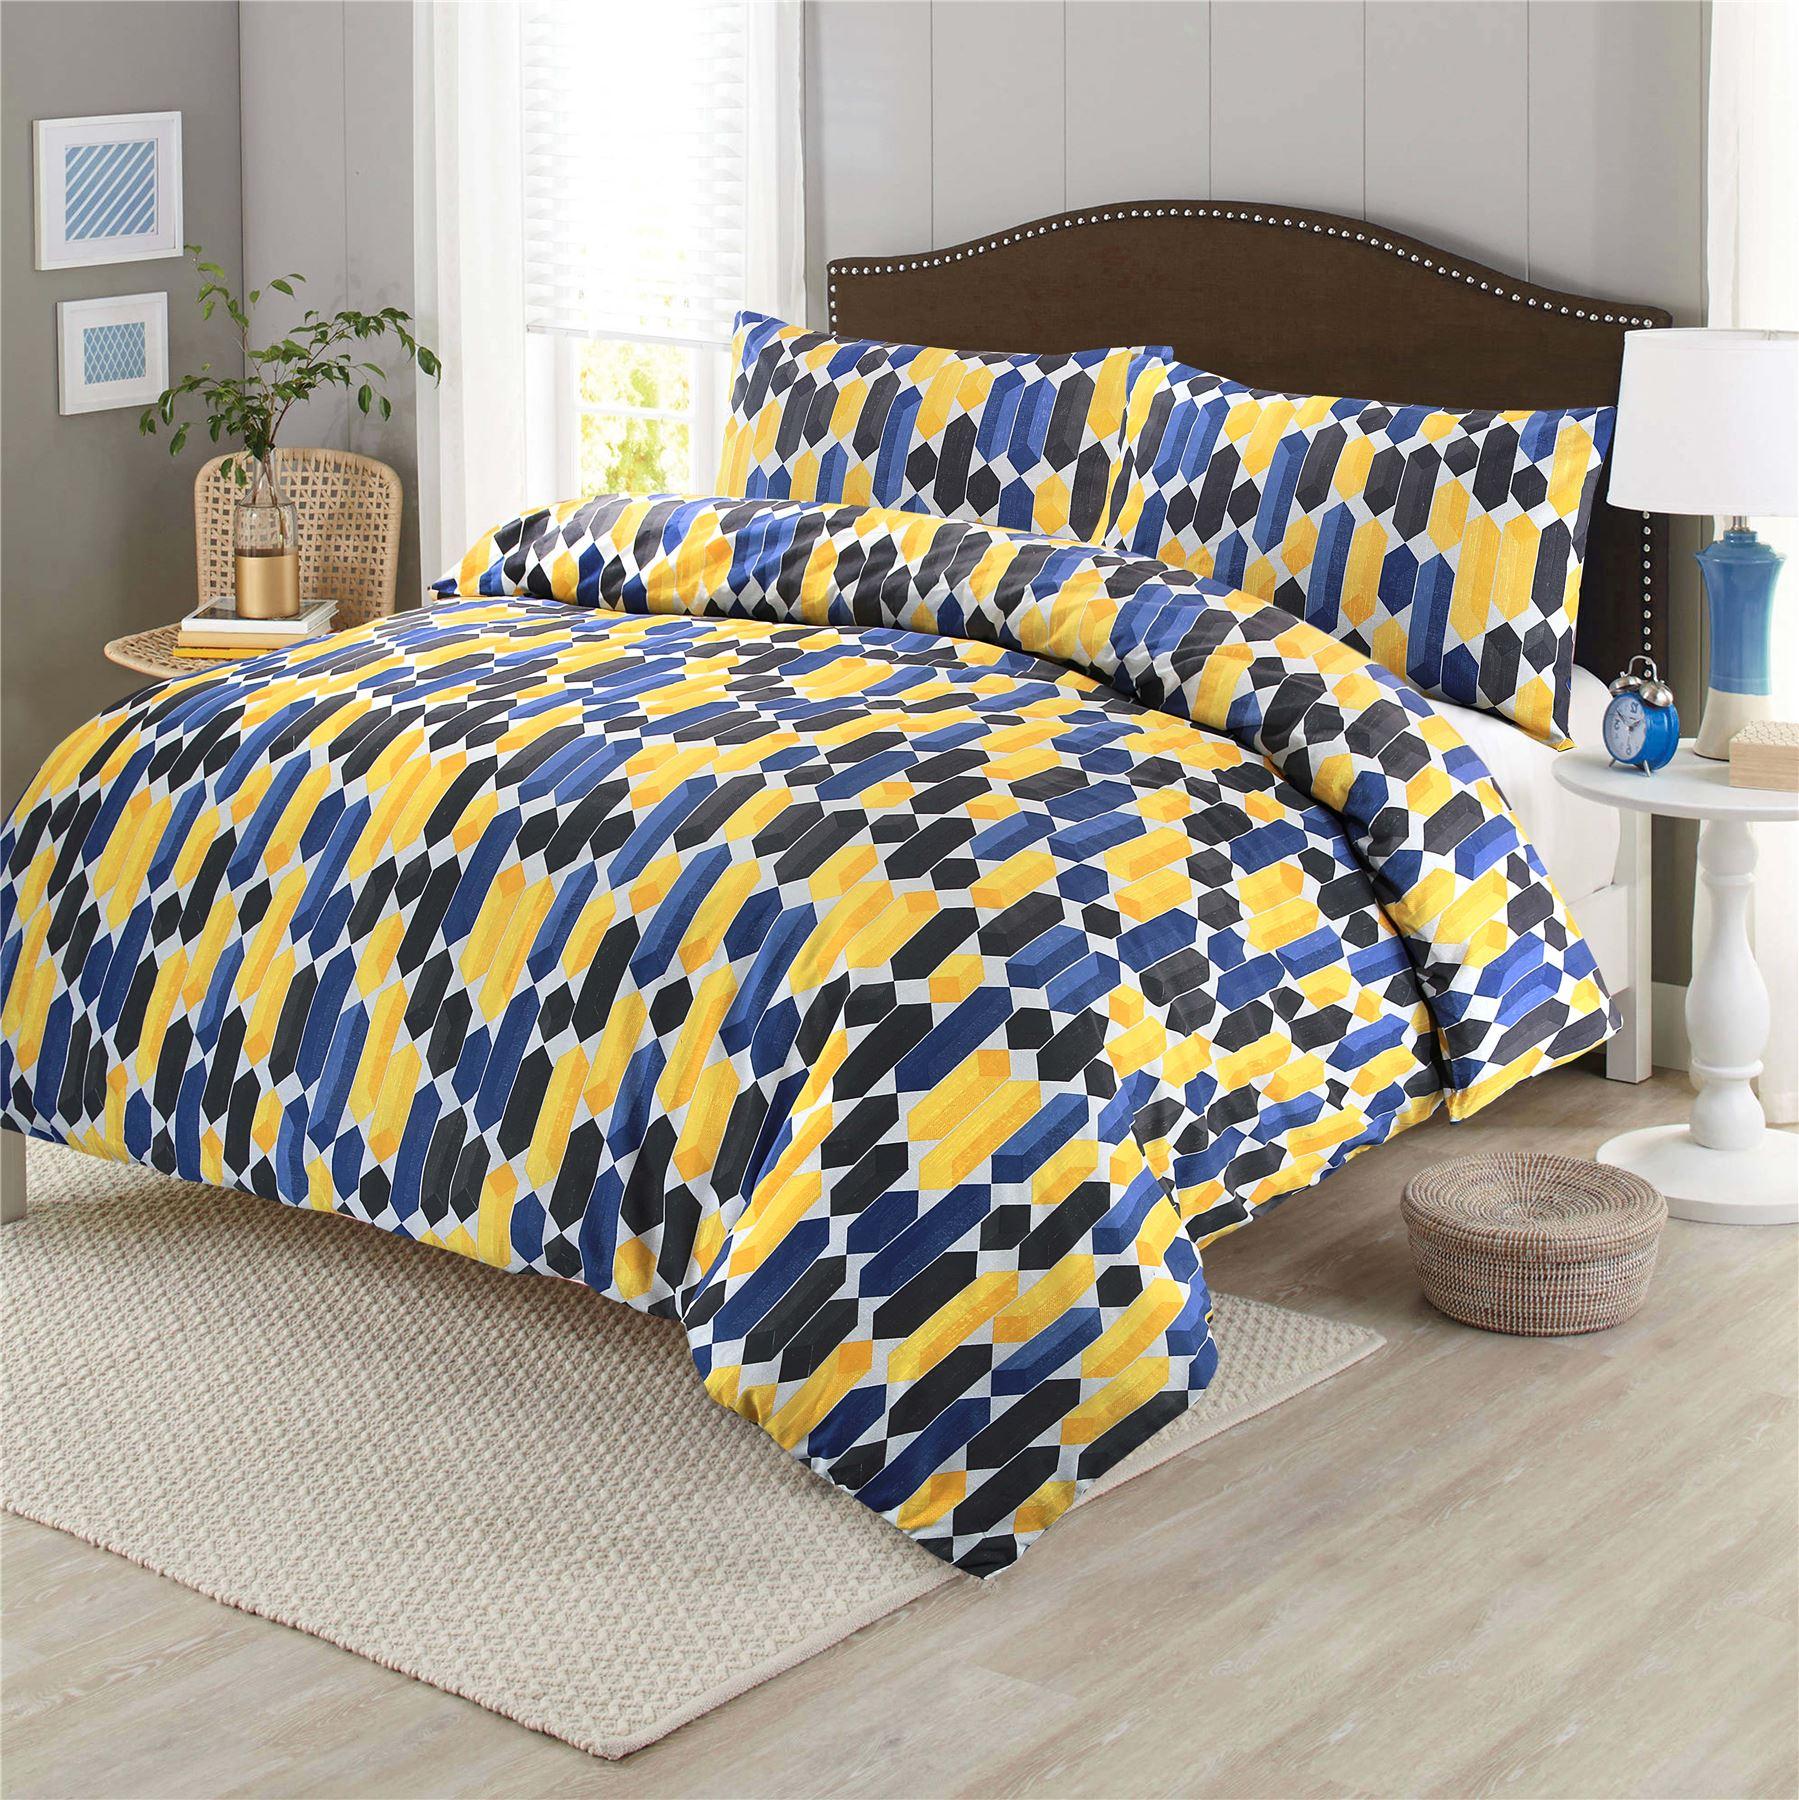 Geometric Shapes Printed Duvet Cover Set Quilt Bedding Single Double King Blue